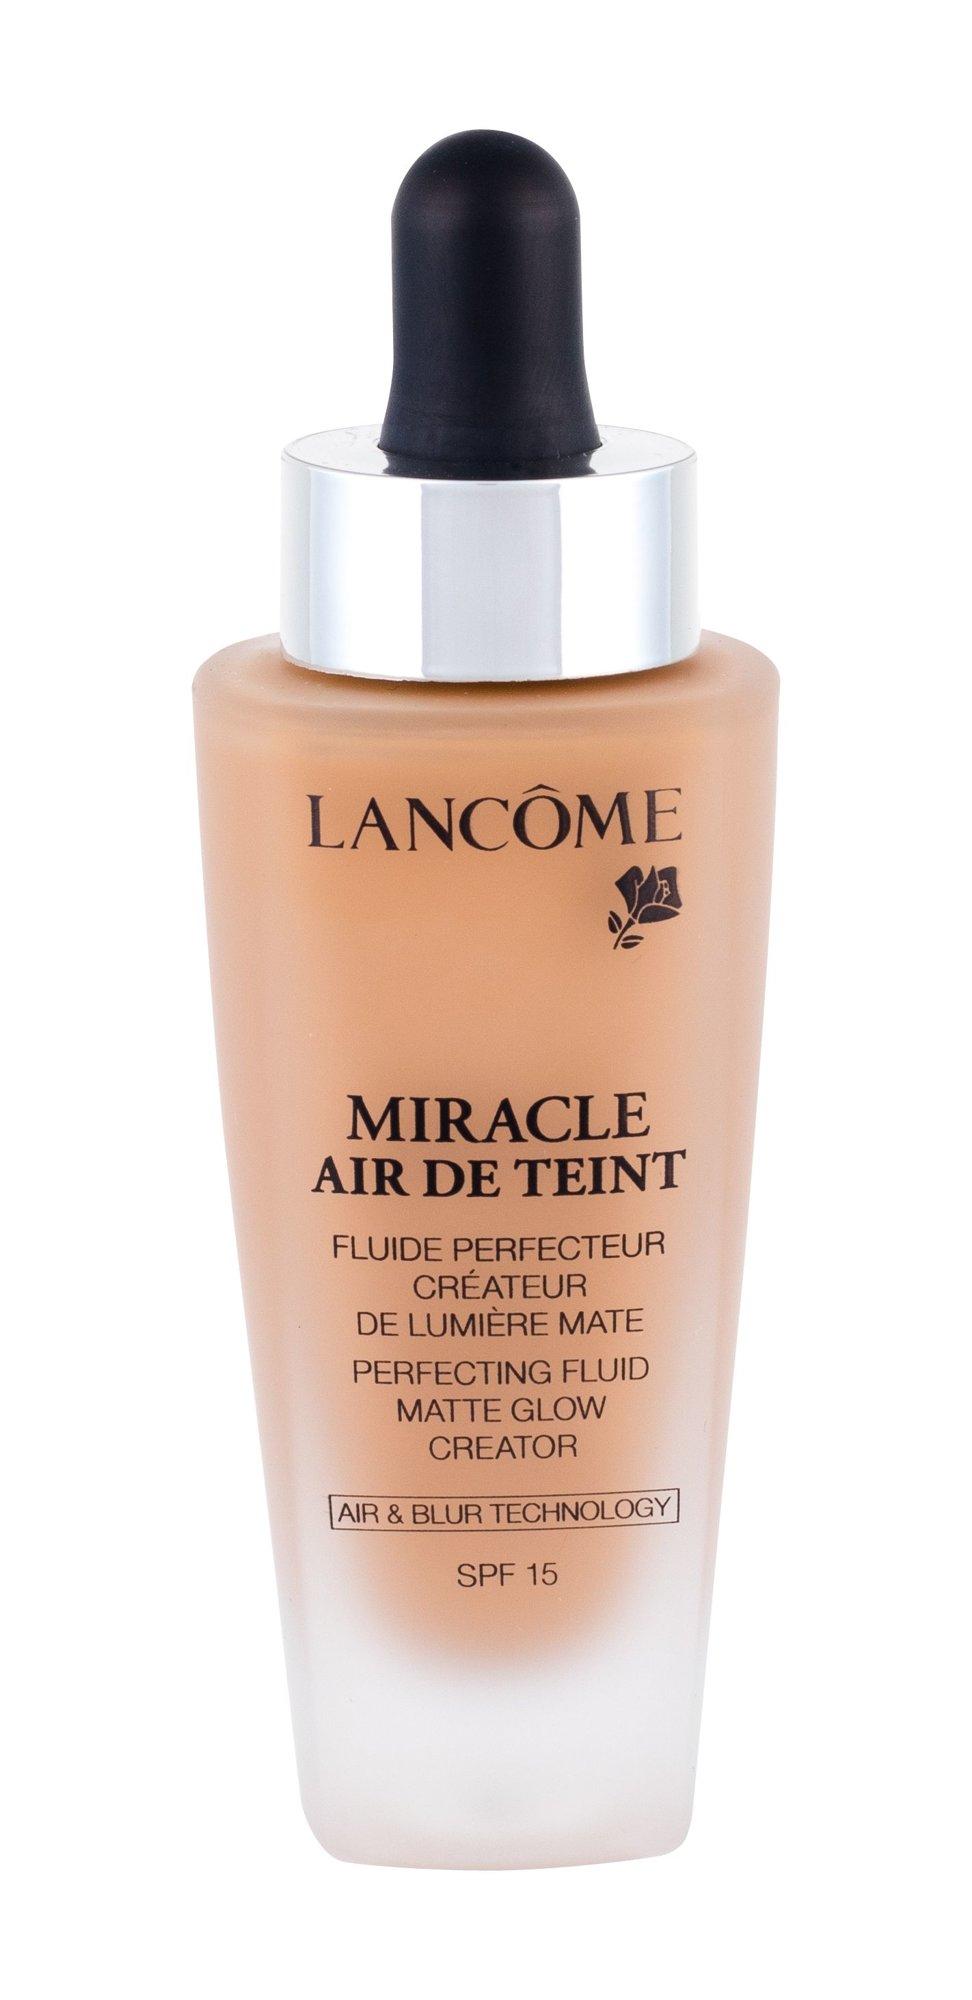 Lancôme Miracle Air De Teint Cosmetic 30ml 03 Beige Diaphane